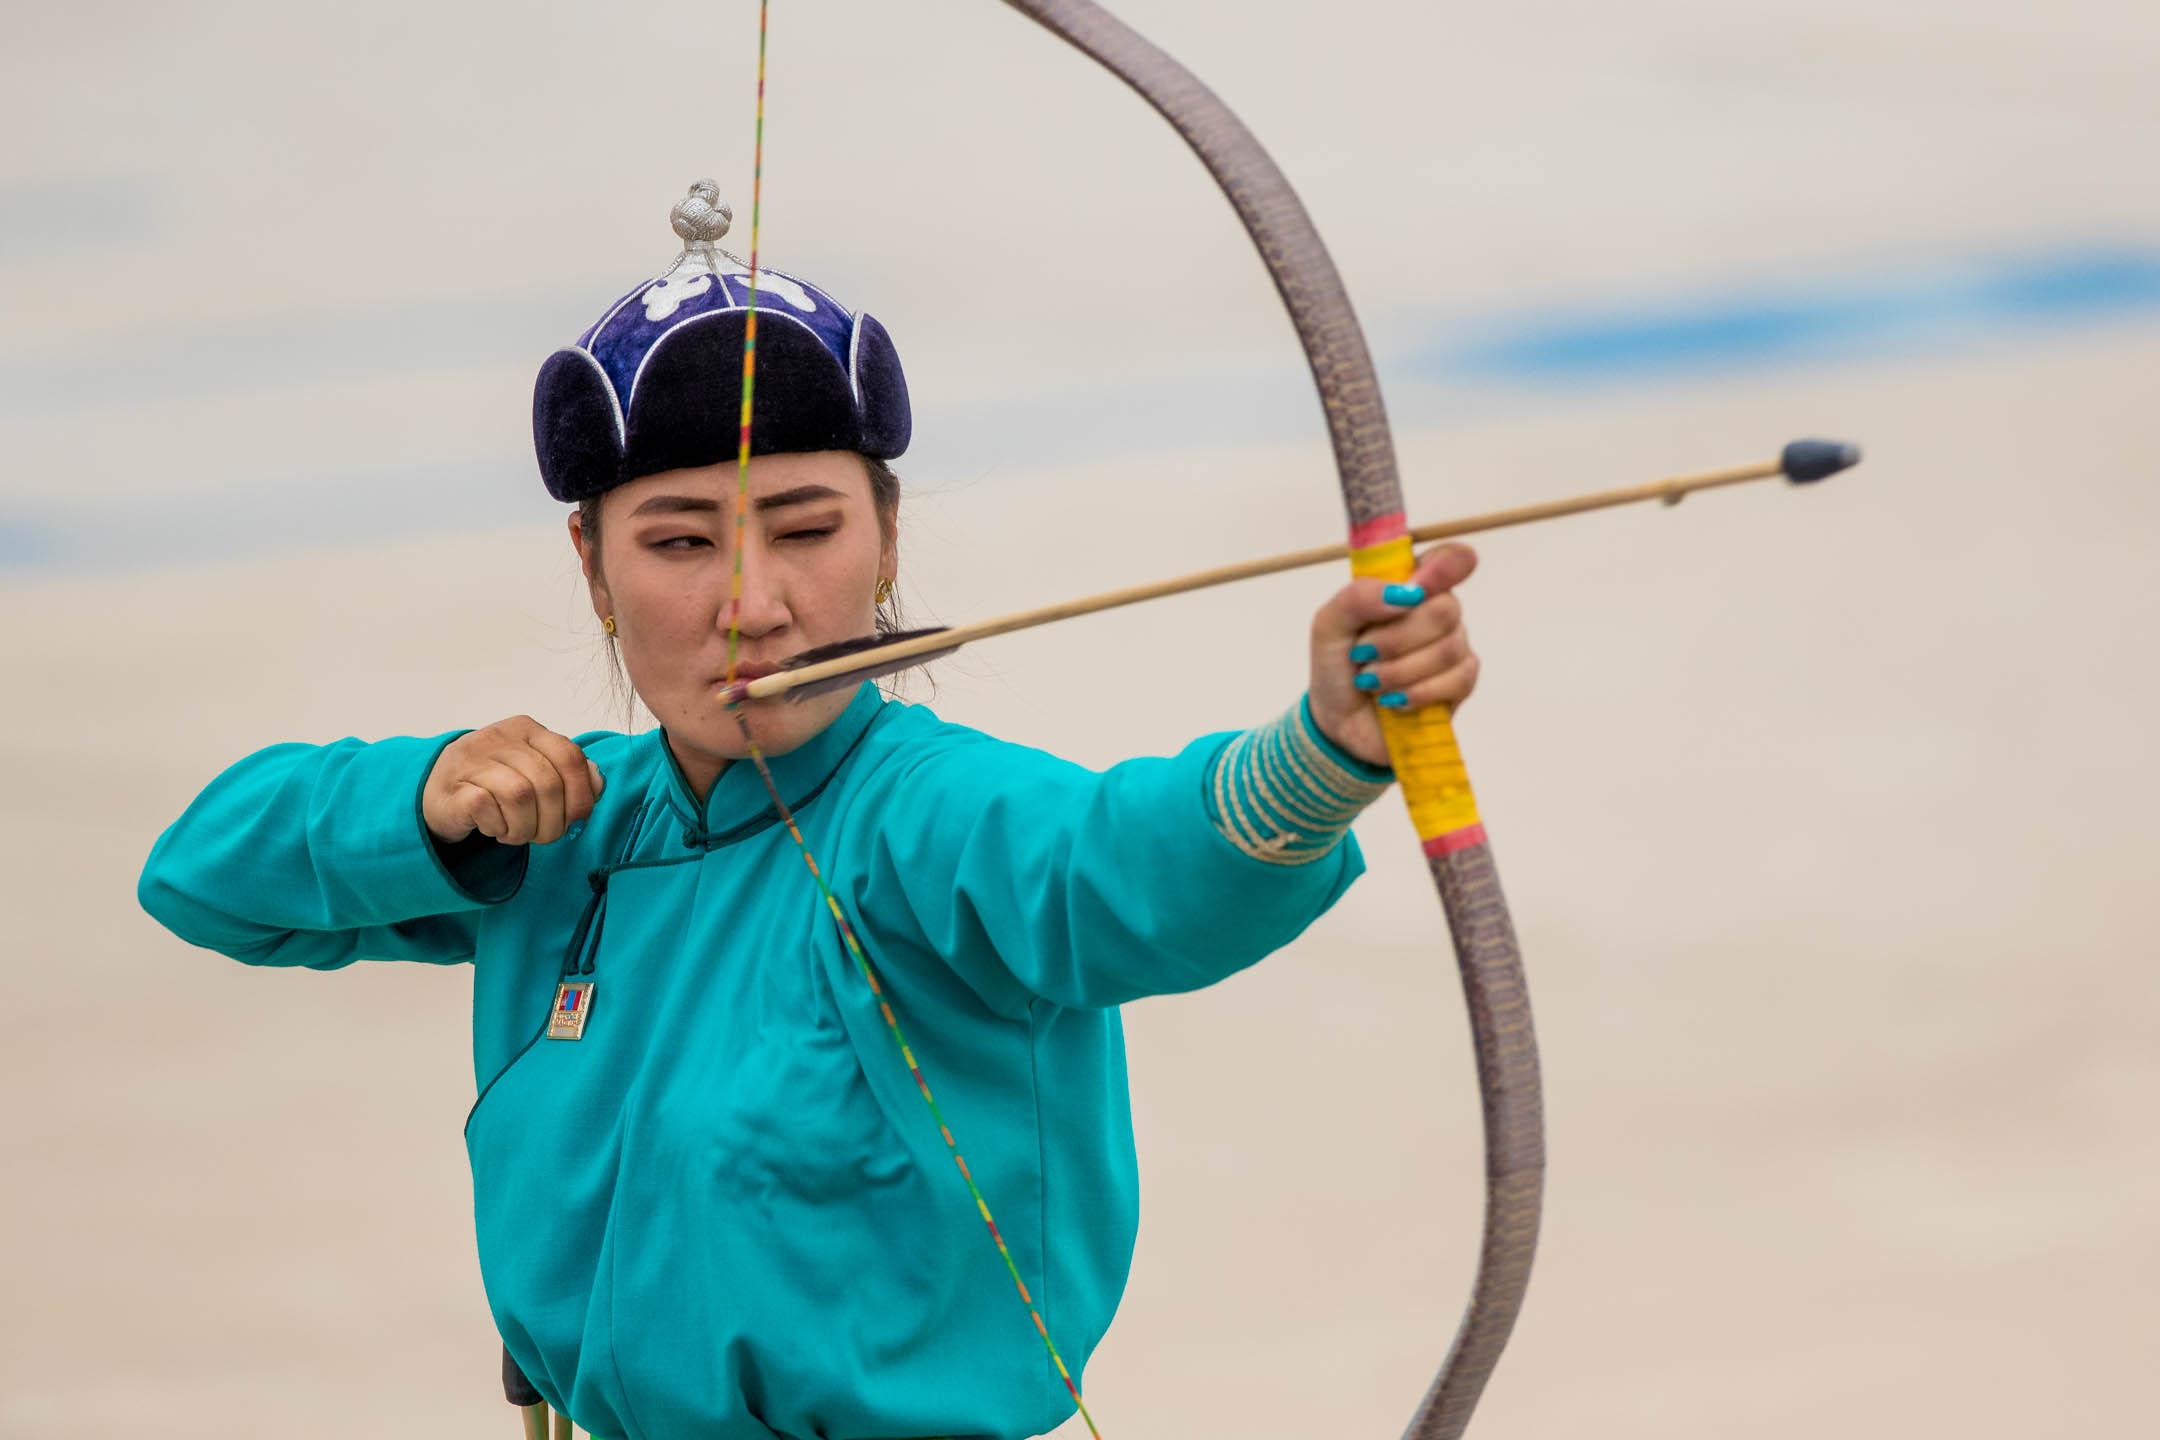 People-Mongolia-Naadam-archery-sport-wom